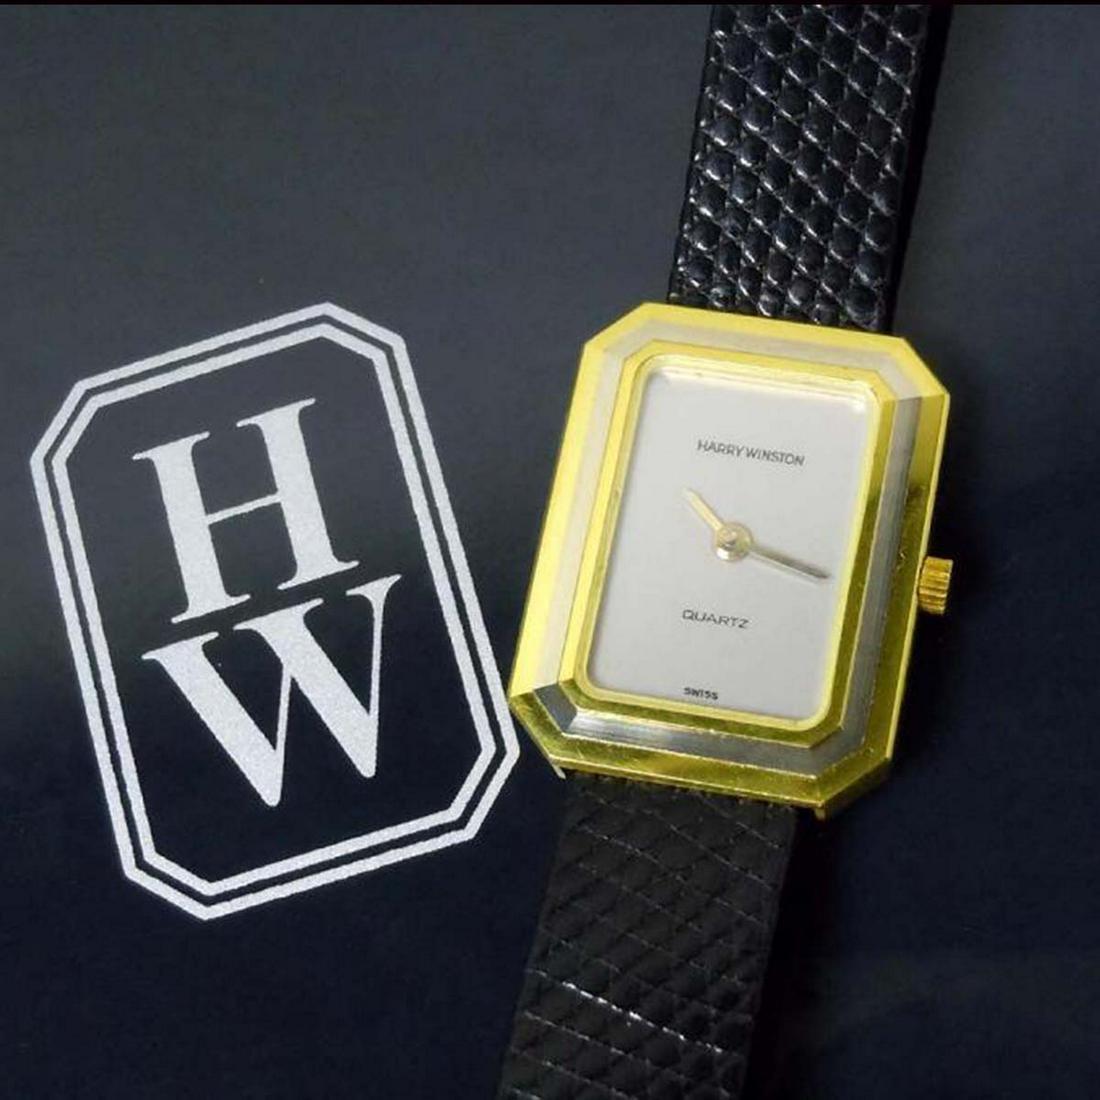 HARRY WINSTON 18KT YELLOW GOLD DRESS WATCH, MODEL 14474